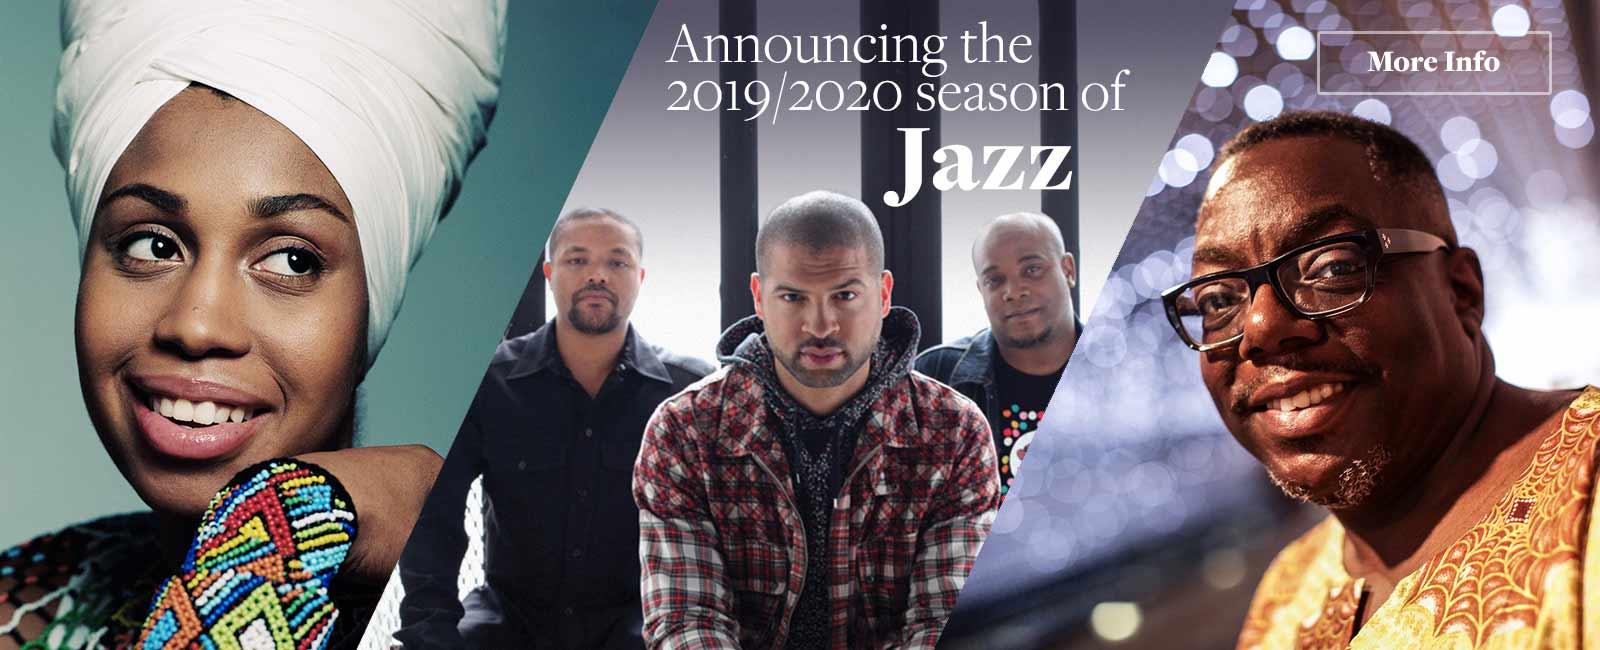 1920_JazzAnnouncement_banner-ad-1600x650